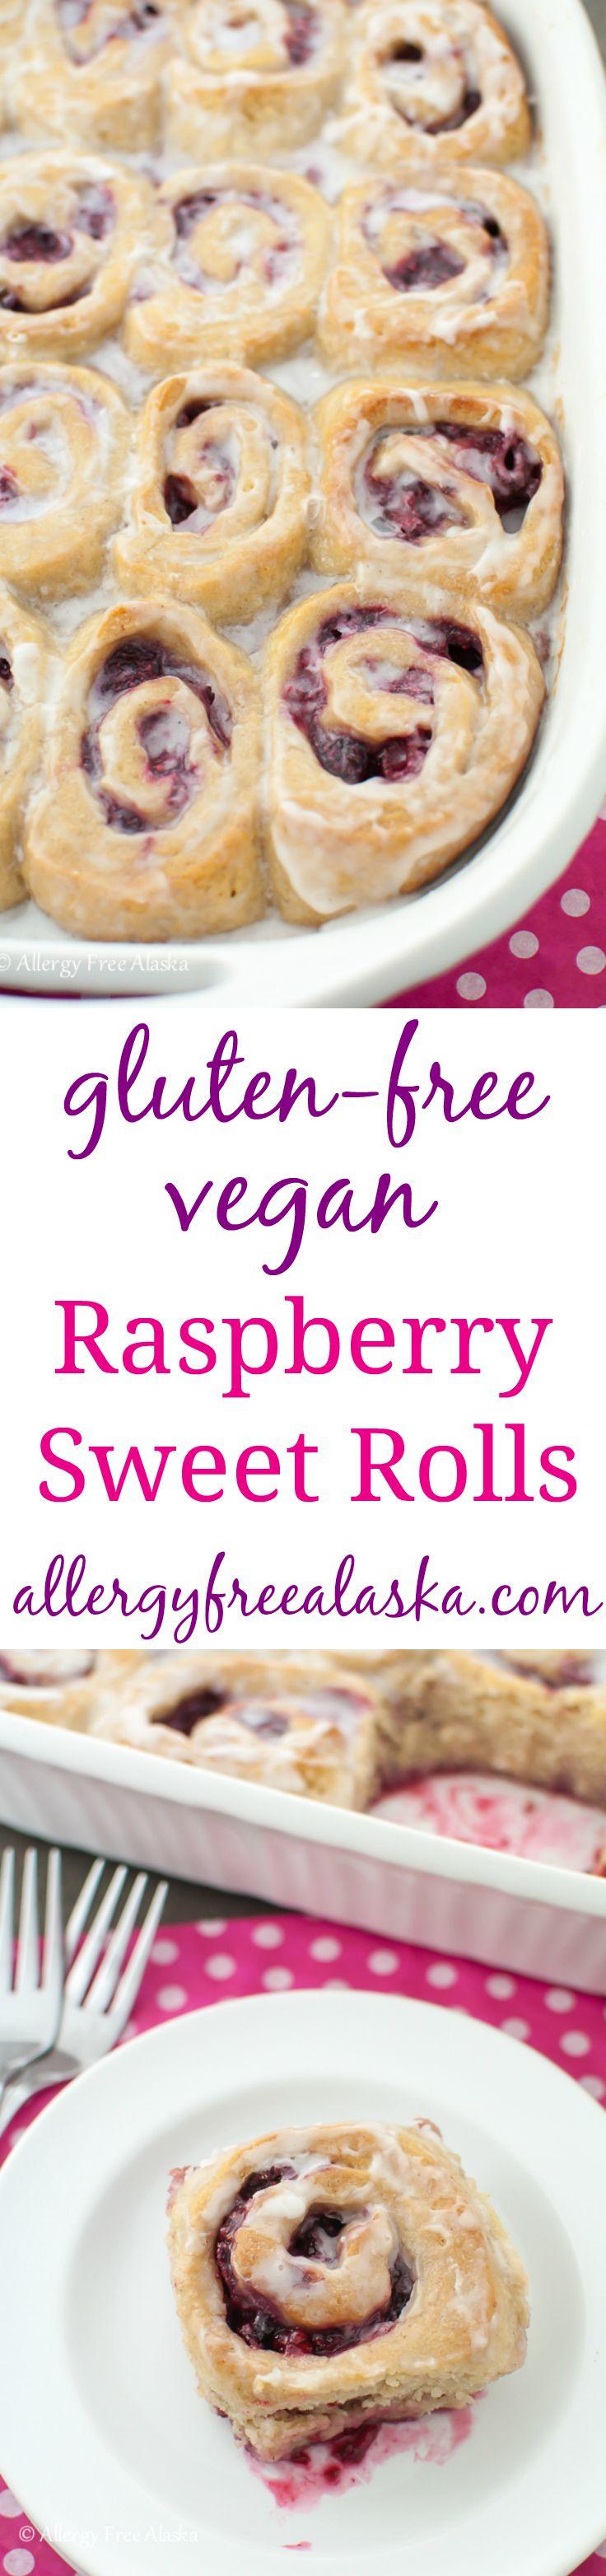 Gluten-Free Vegan Raspberry Sweet Rolls Recipe from Allergy Free Alaska